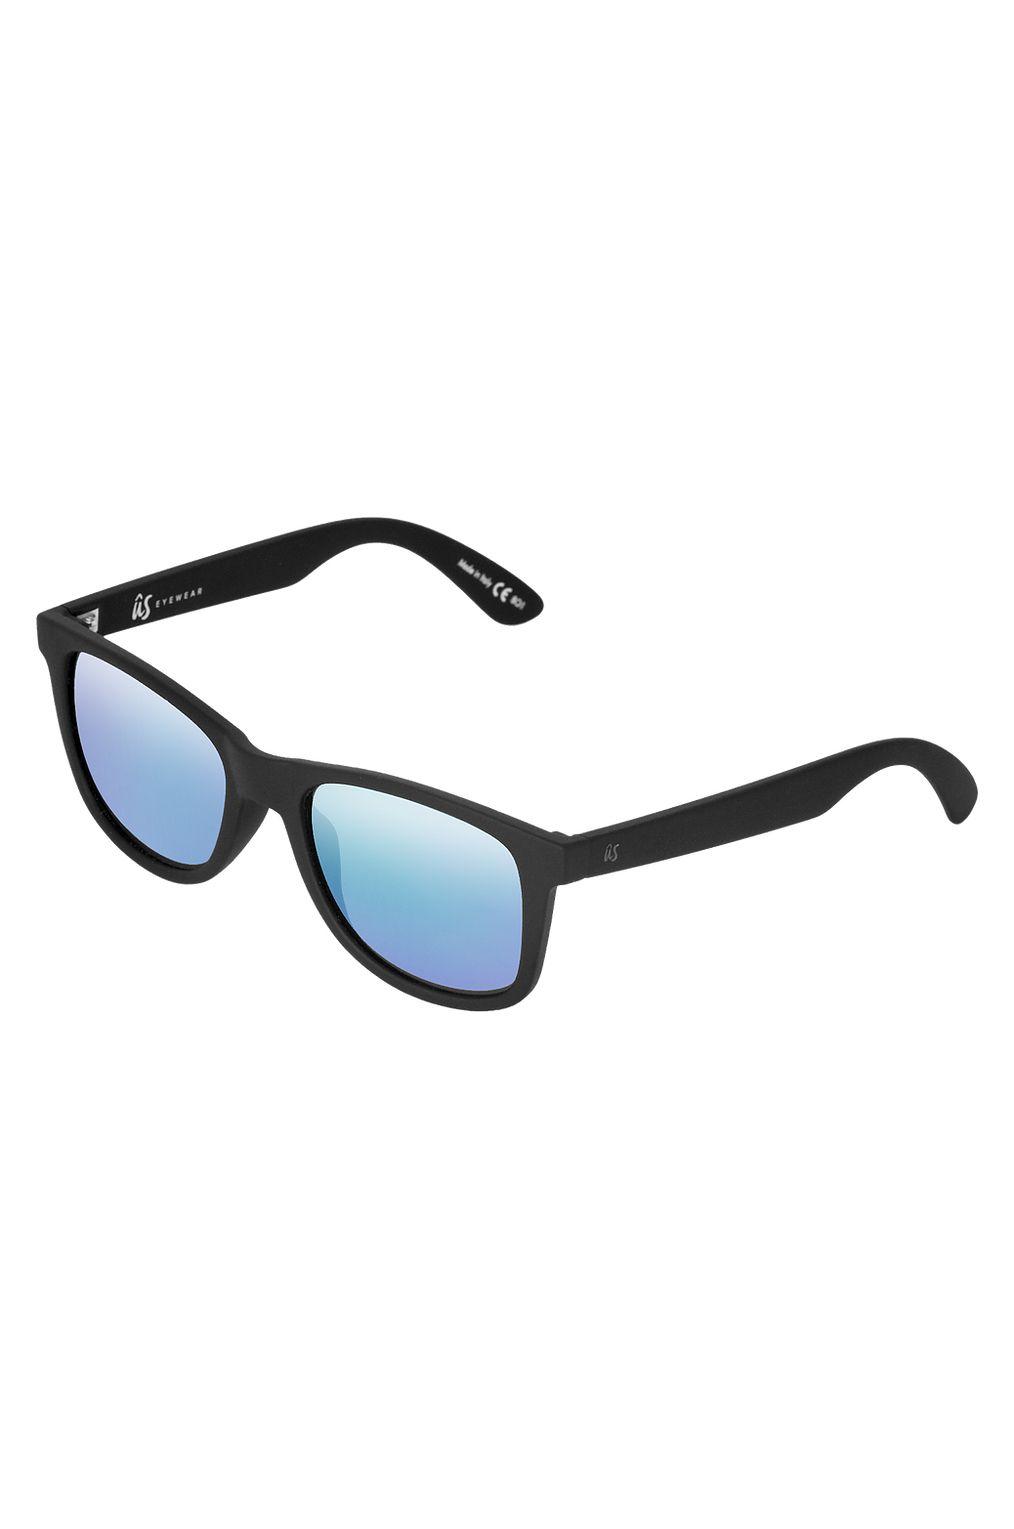 Oculos US MATY Matte Black/Grey Blue Chrome